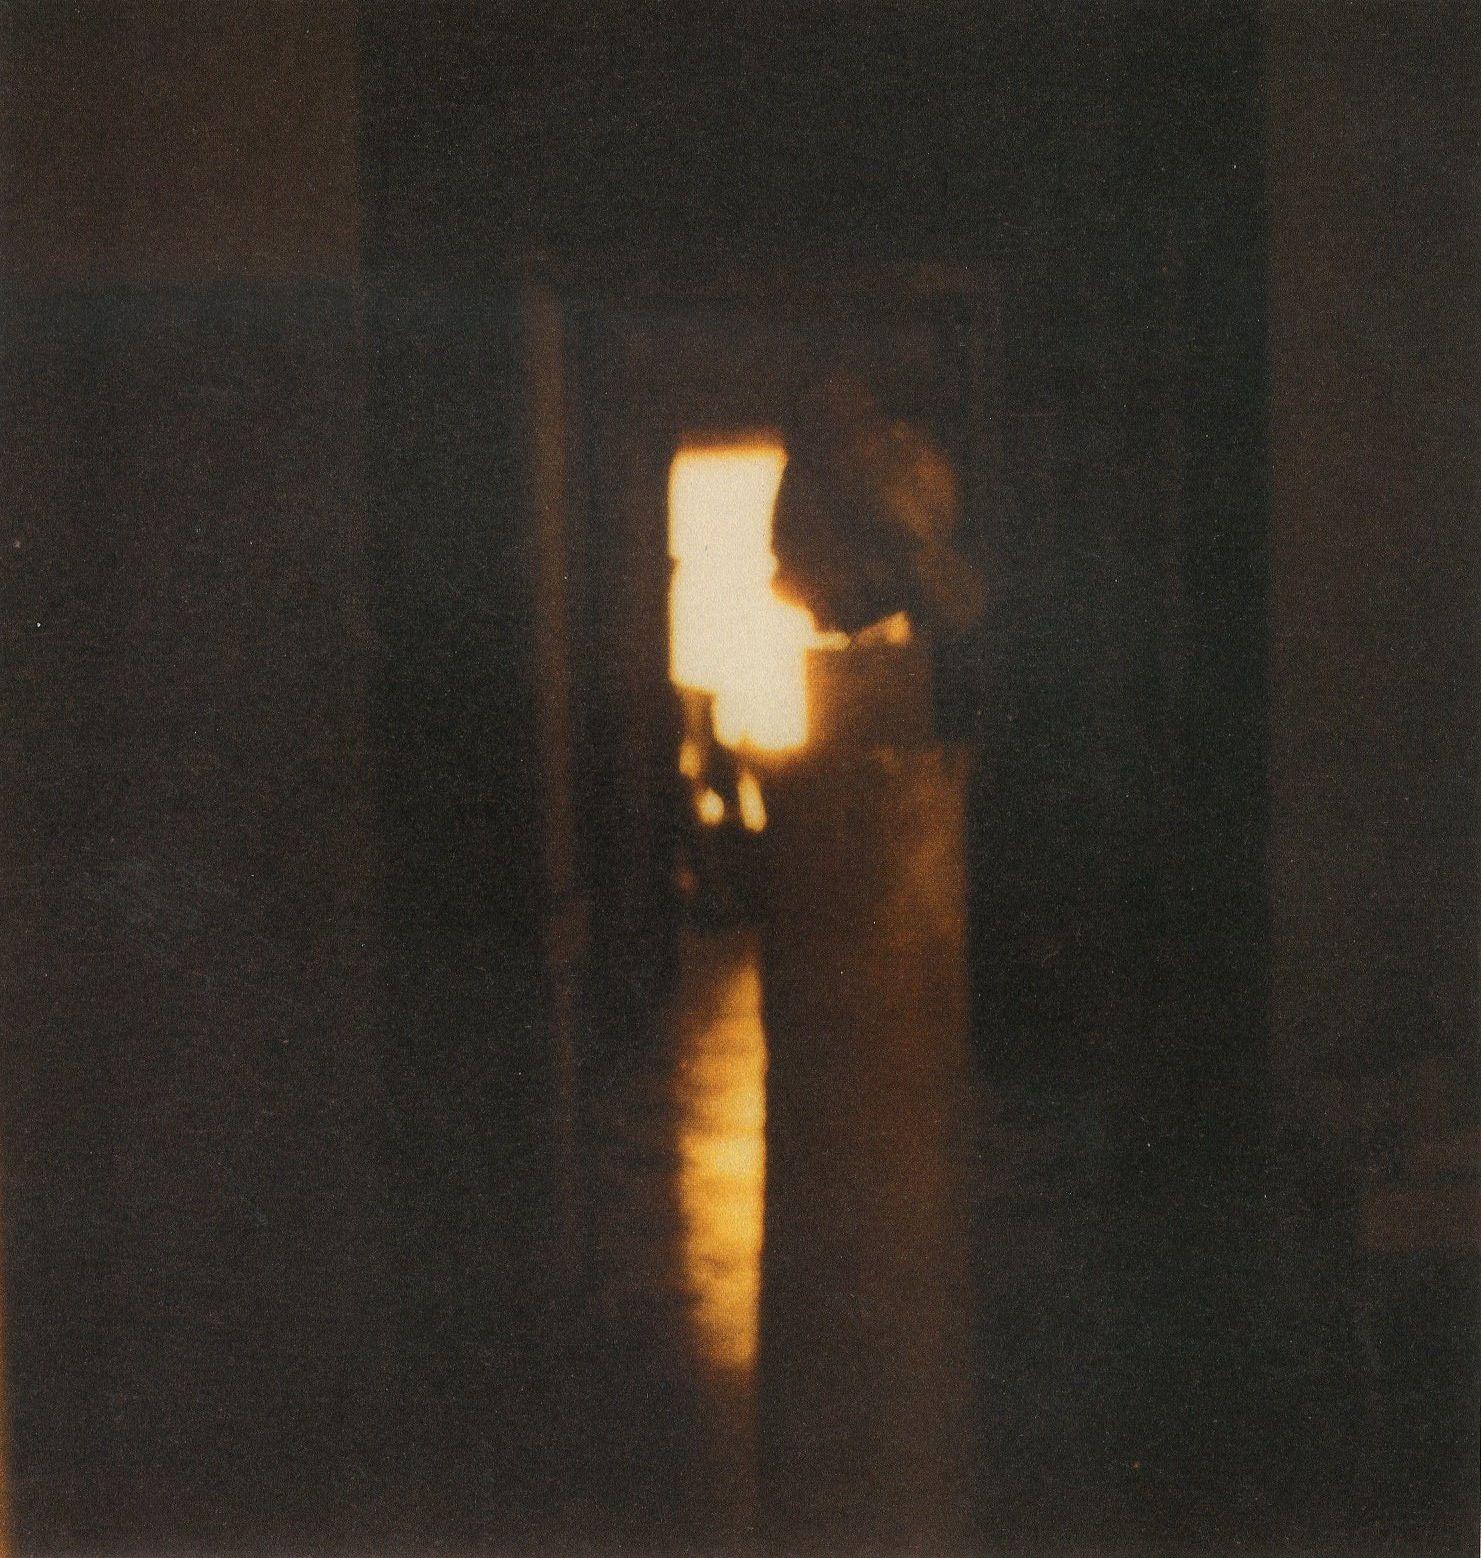 Pilar Cy Twombly' Of Interiors 1951-2007; Rome Gaeta & Nyc; Homes